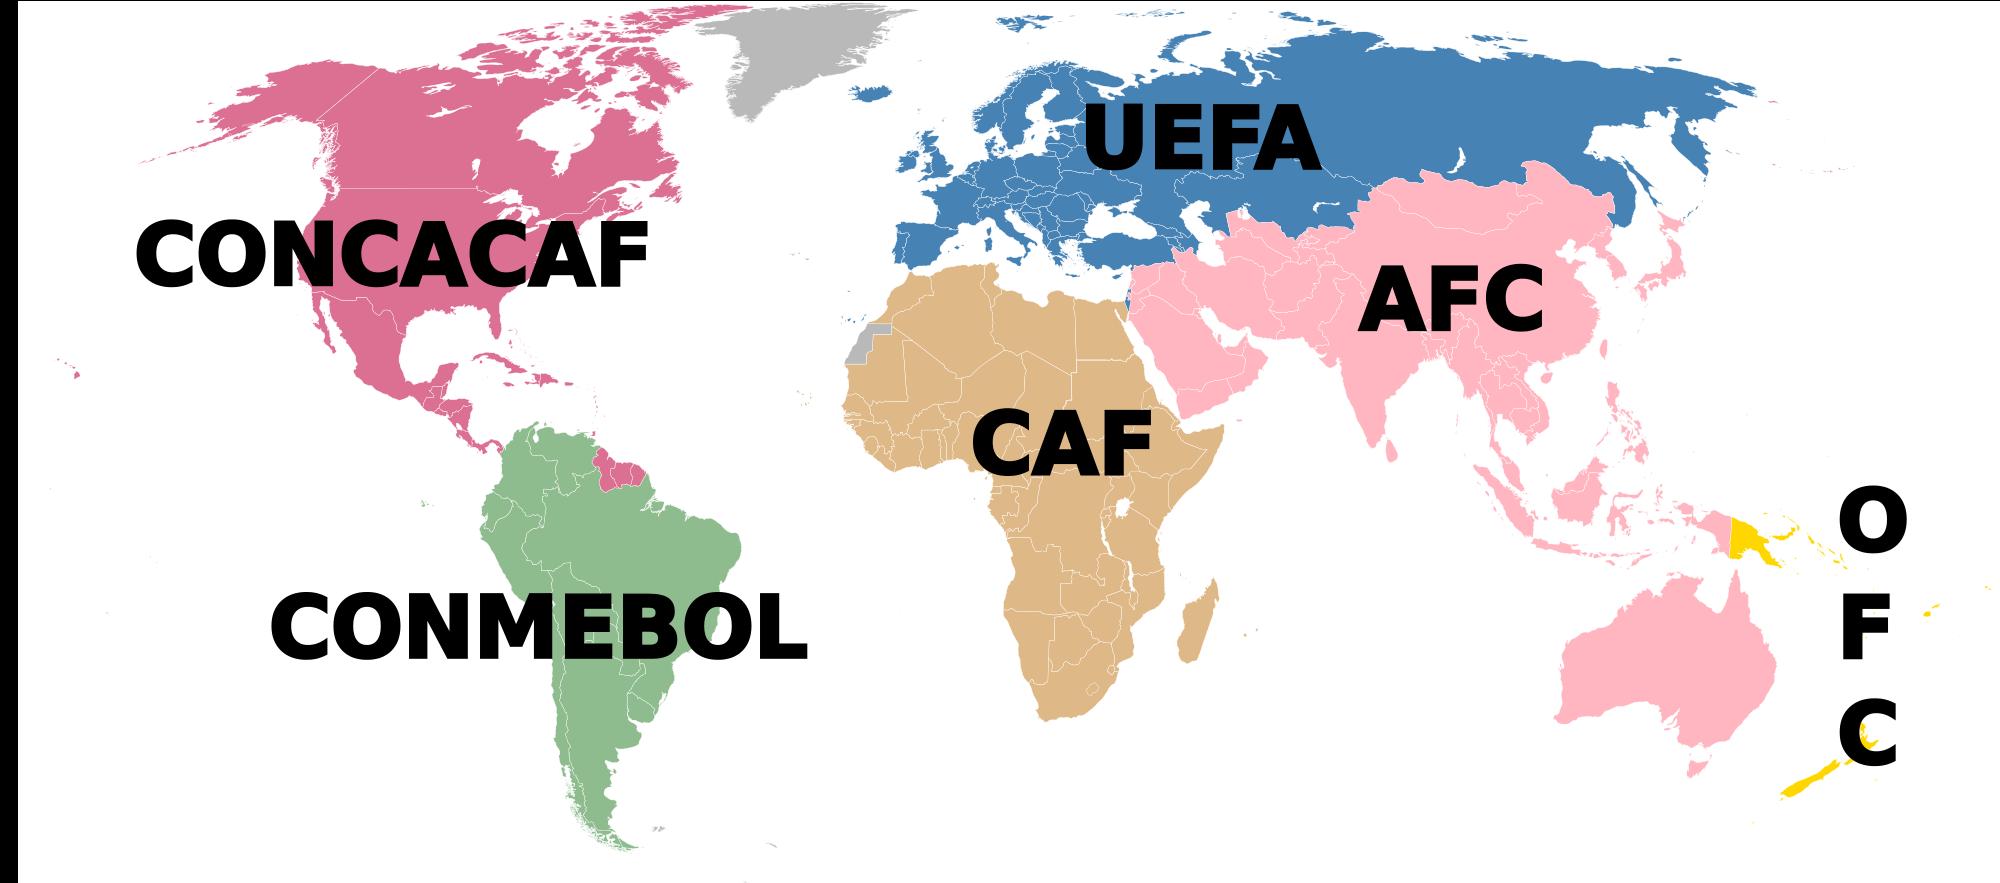 Peta Kekuatan Tim Peserta Piala Dunia Rusia 2018 Zona CONCACAF